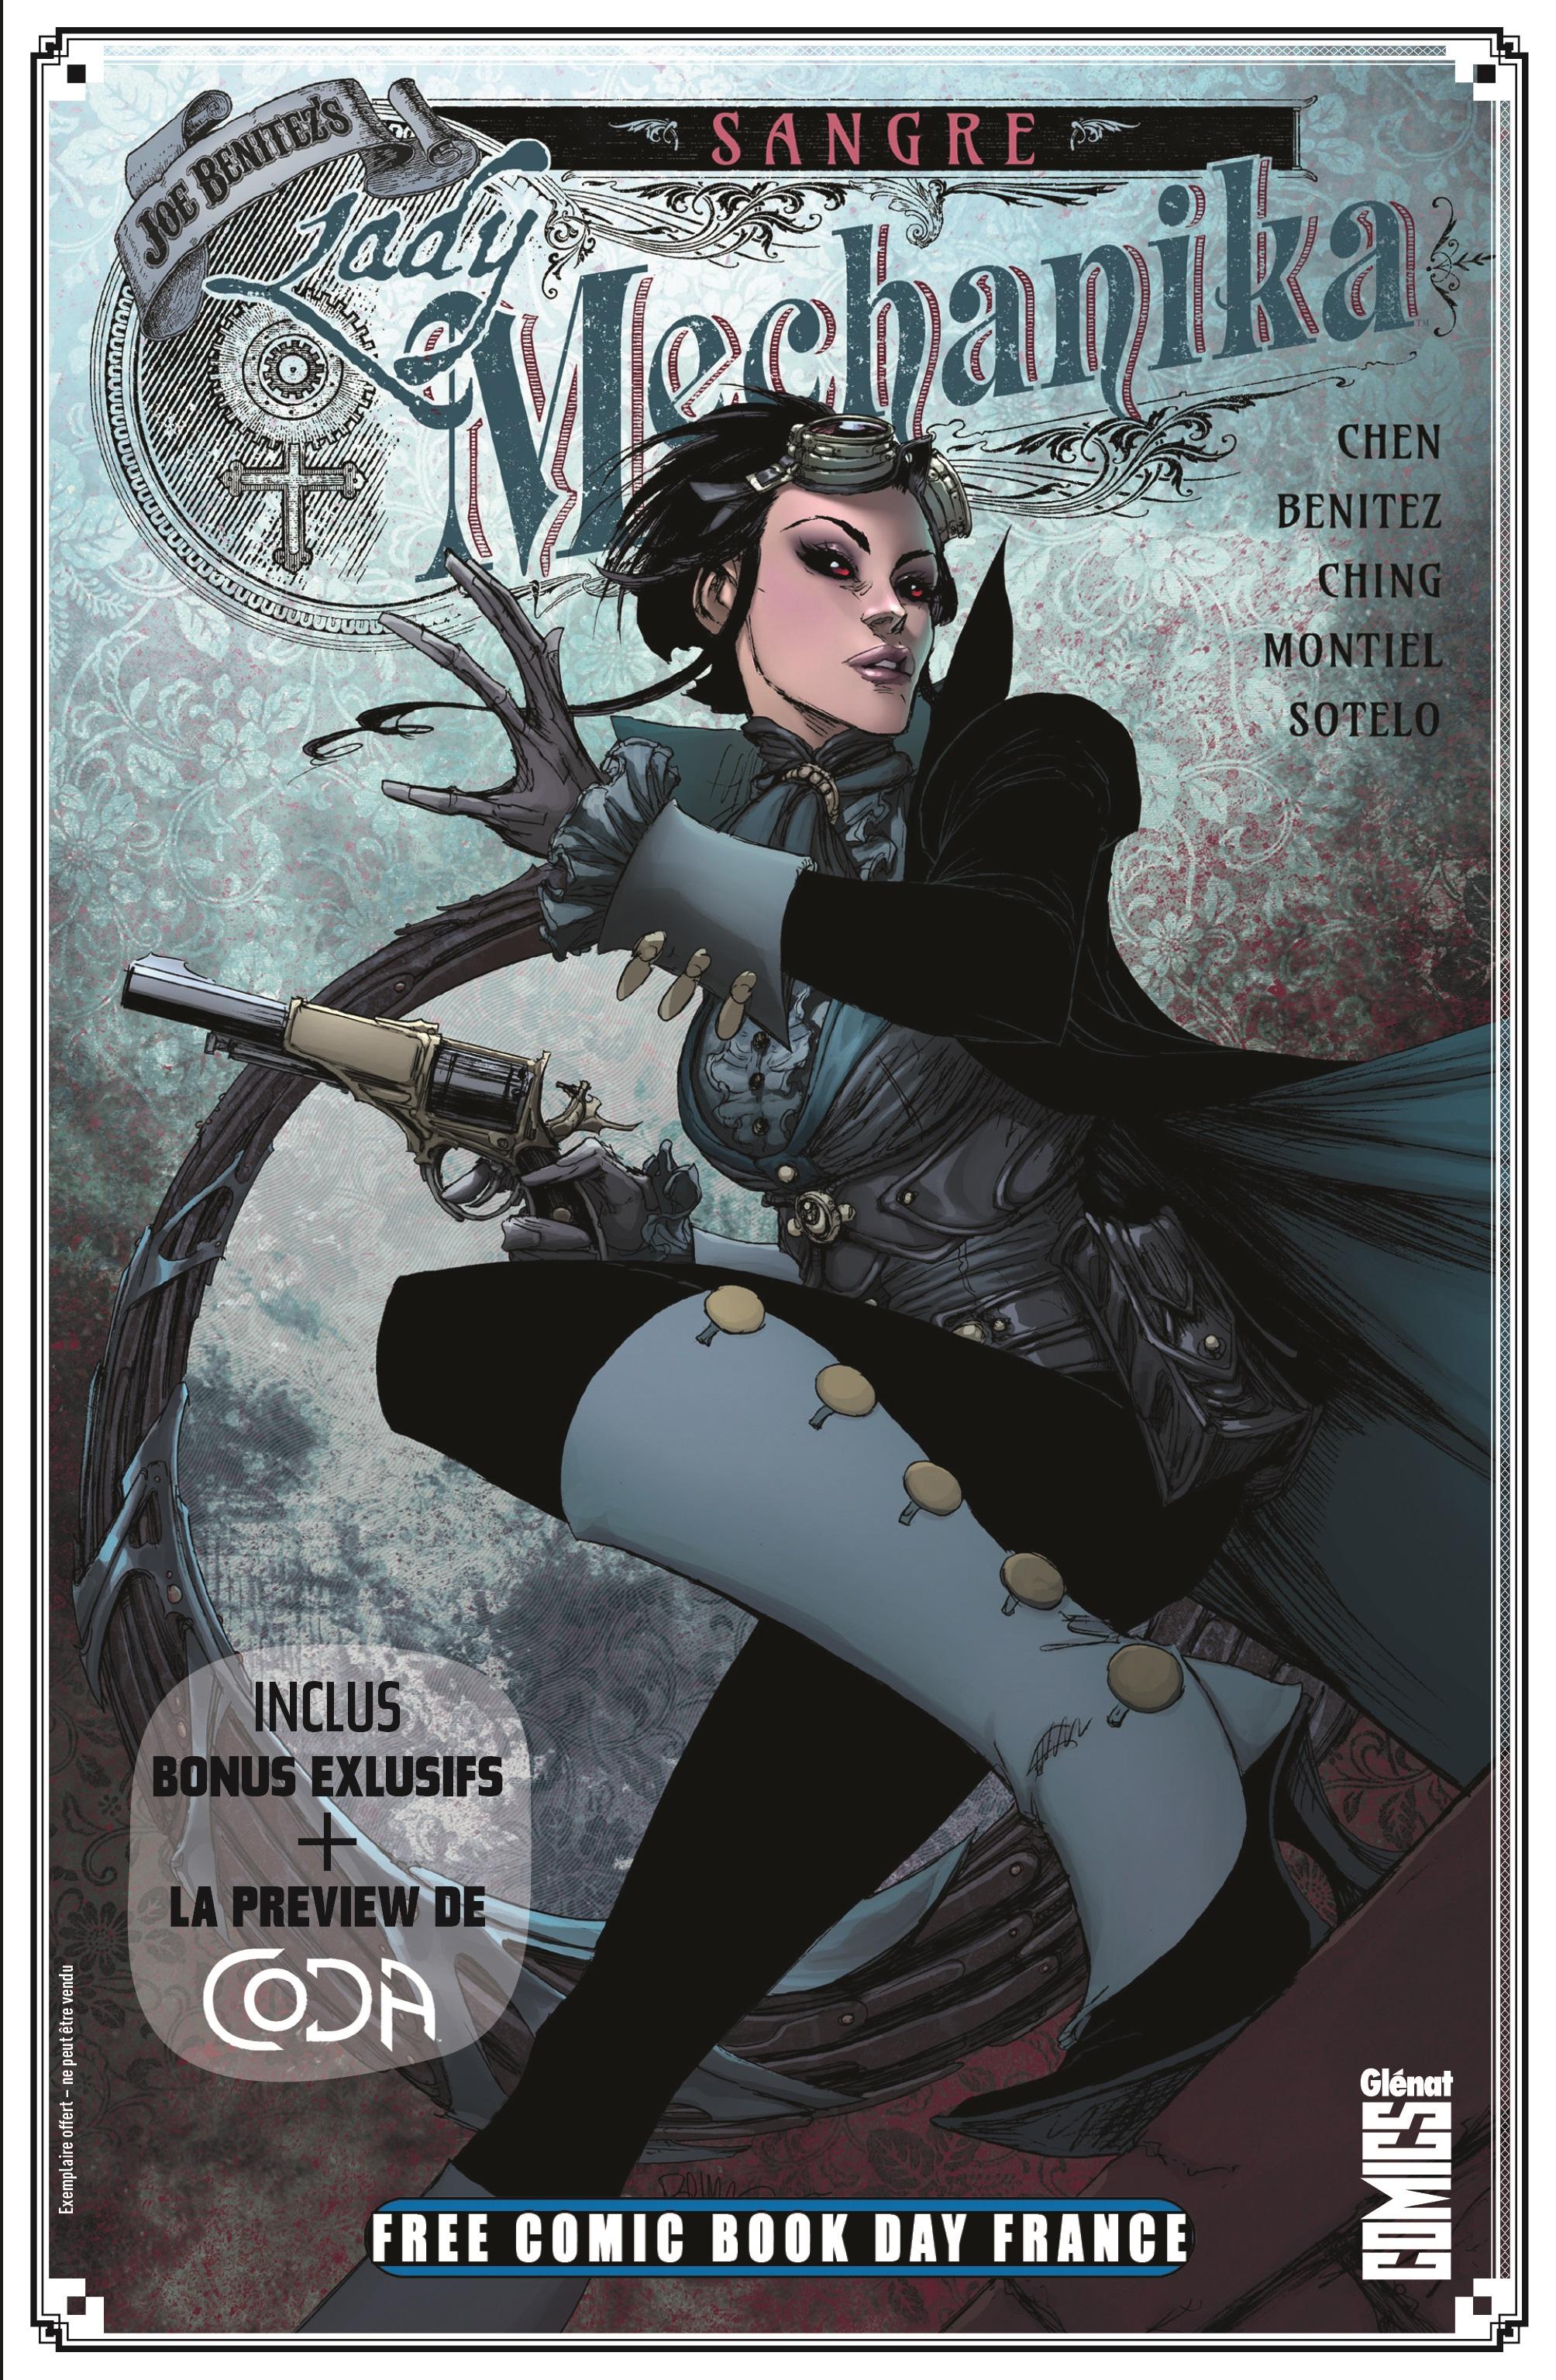 Free Comic Book Day France 2020 - Lady Mechanika : Sangre 1